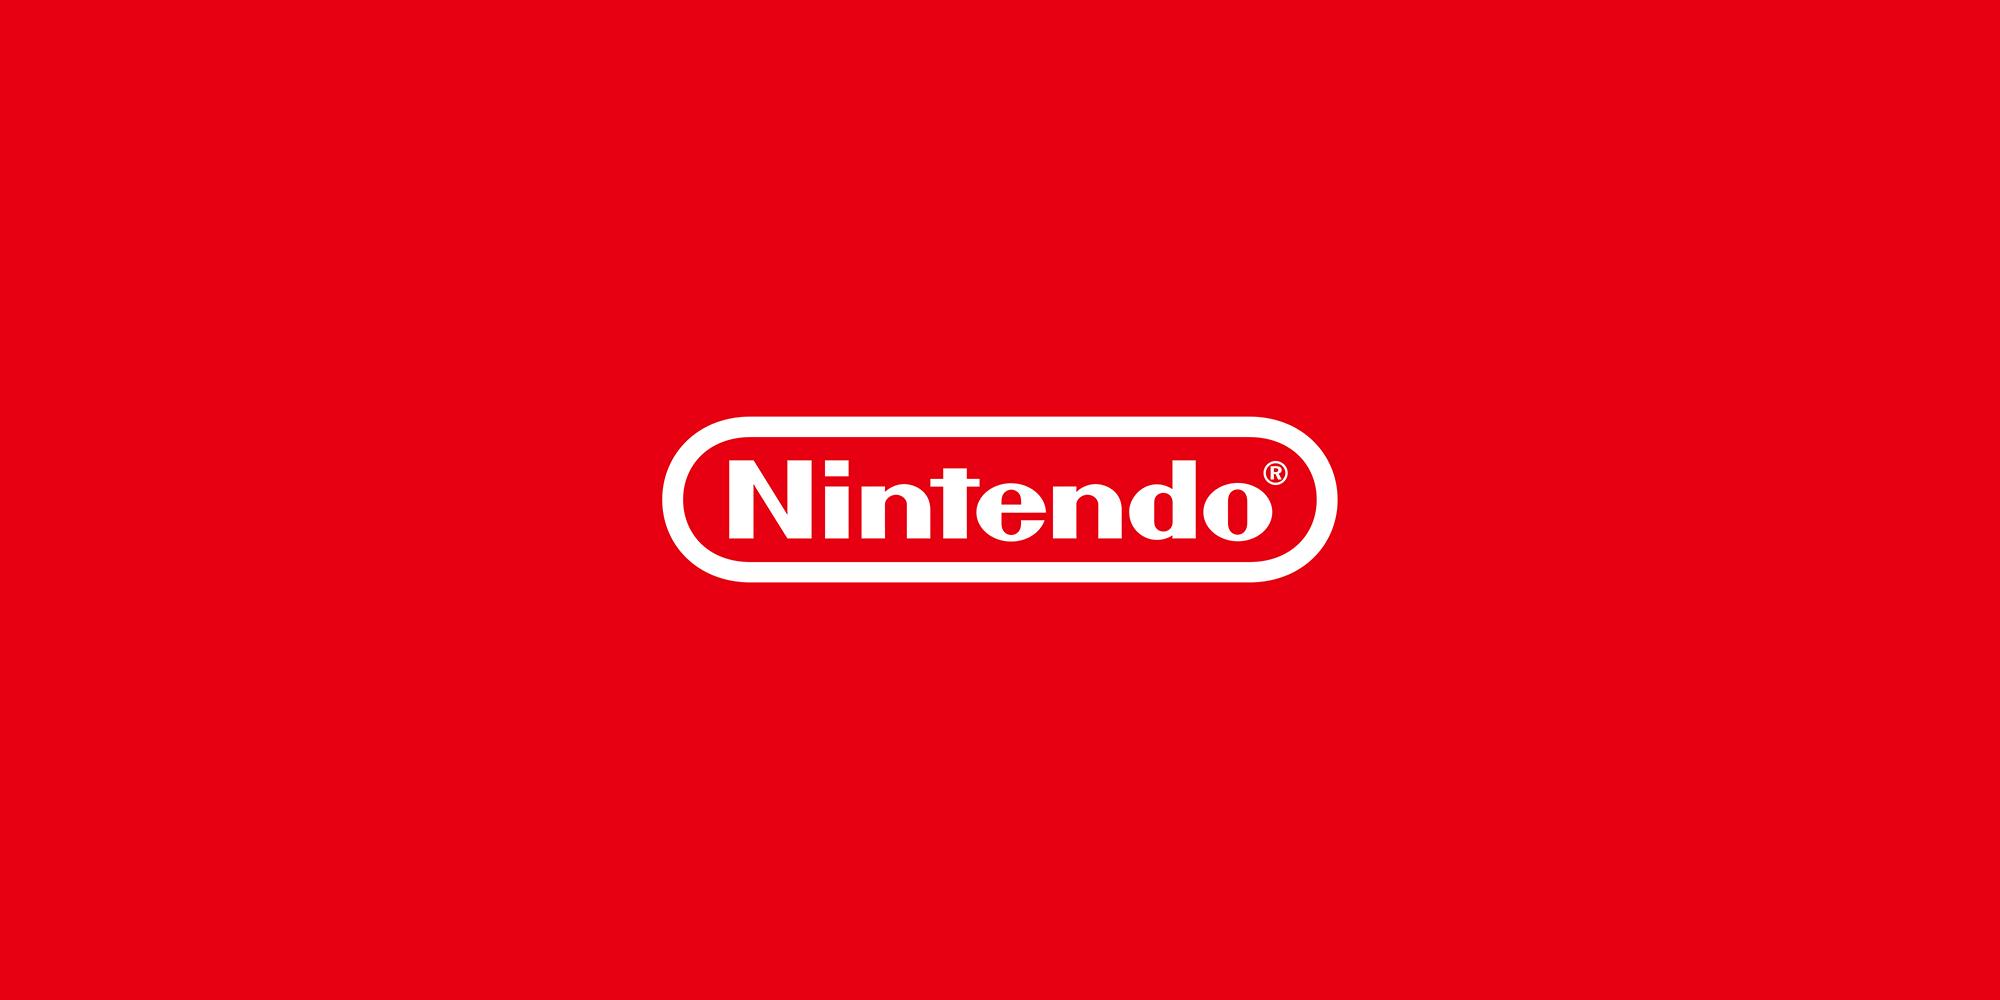 H2x1 NintendoLogo Red 1